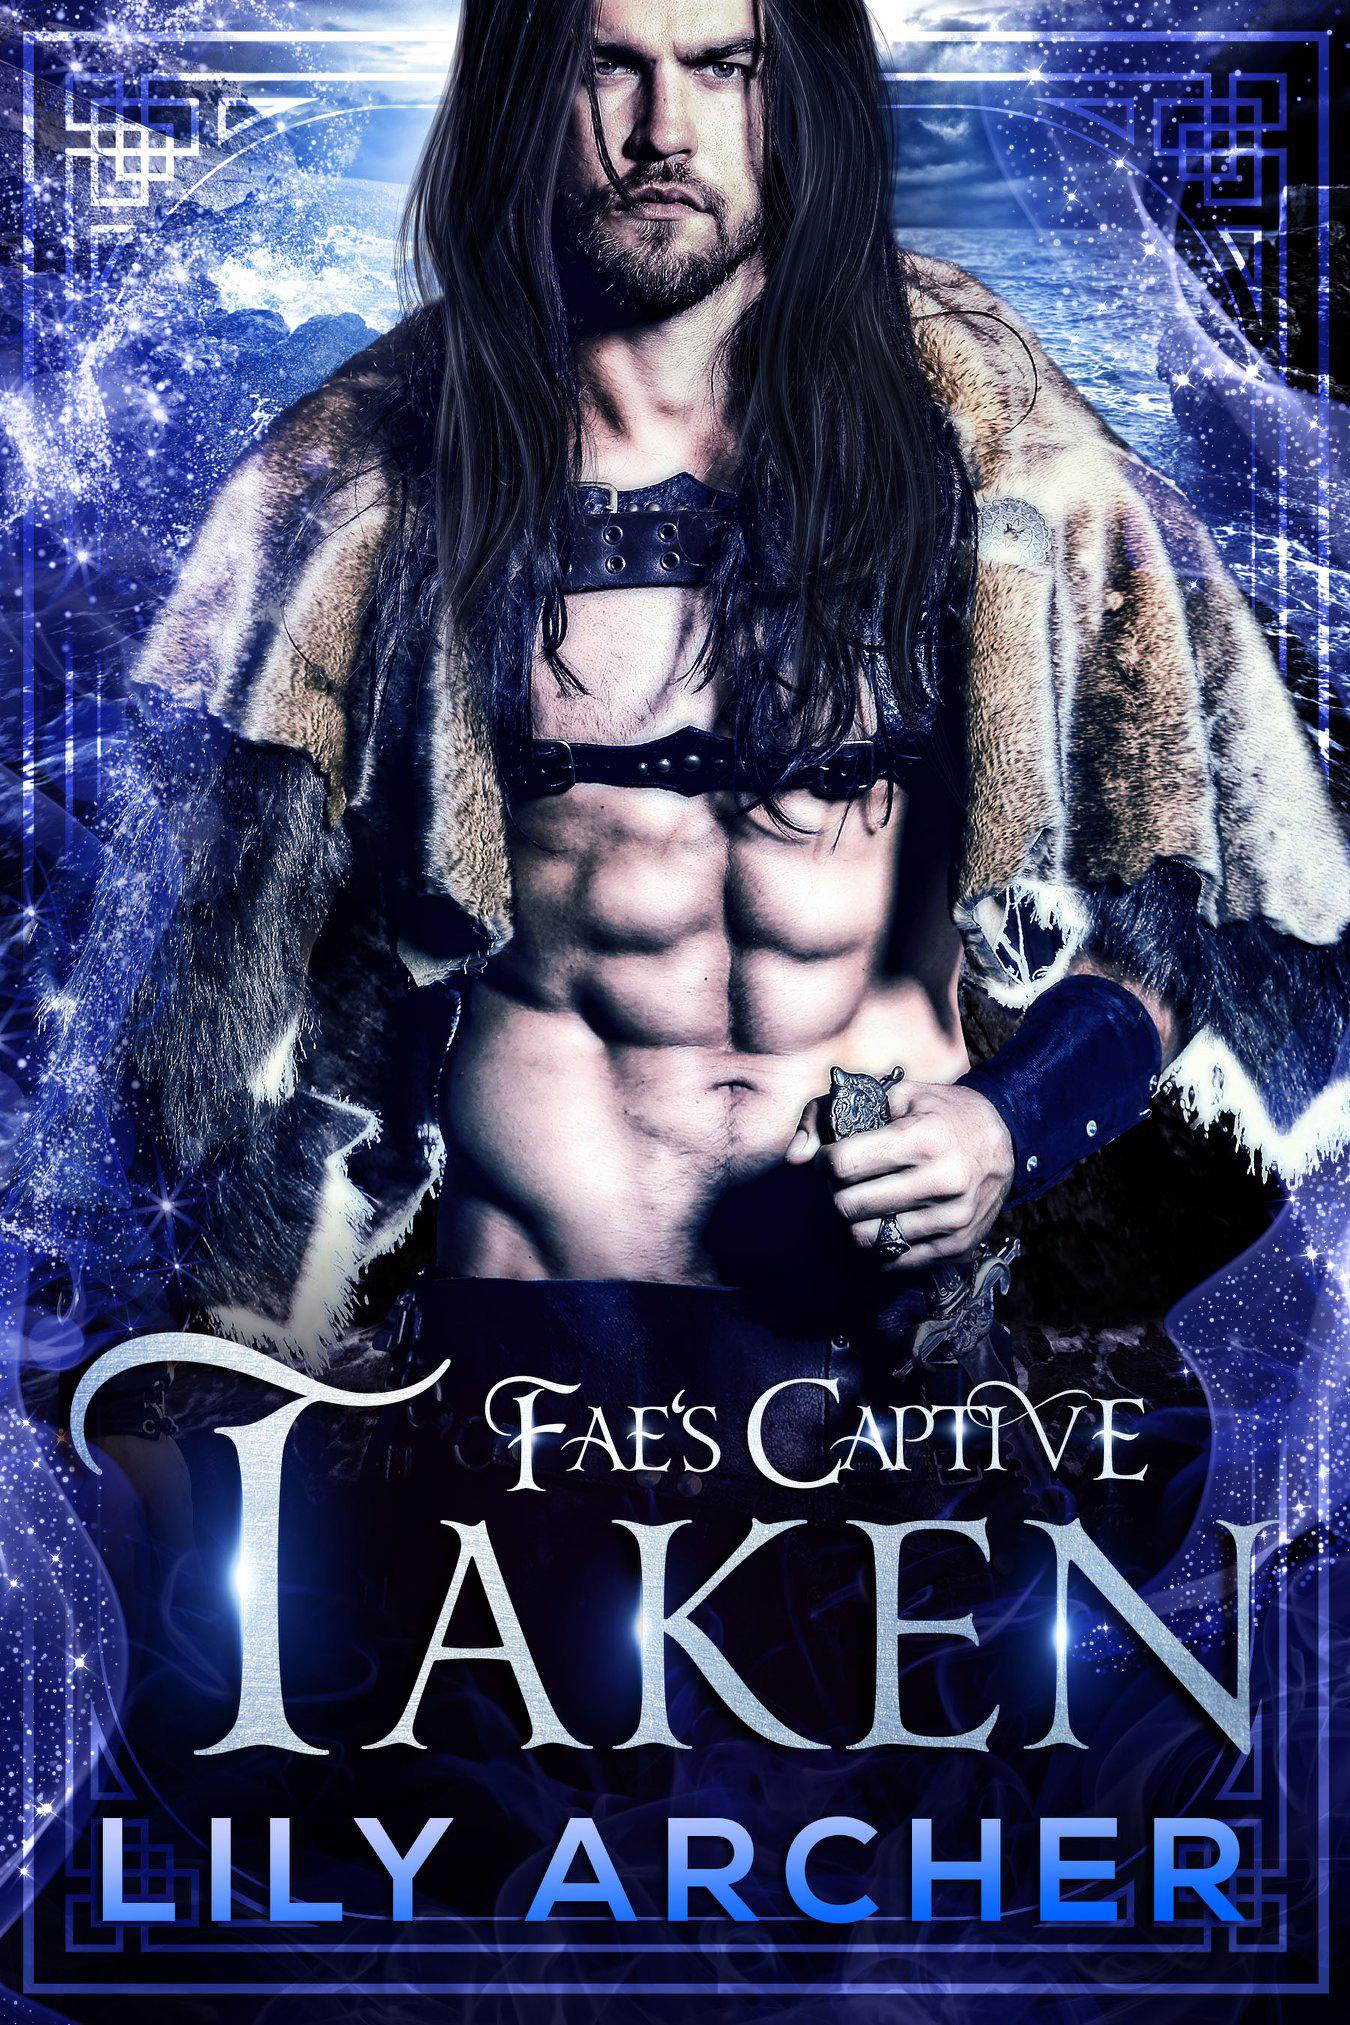 TAKEN - FAE'S CAPTIVE